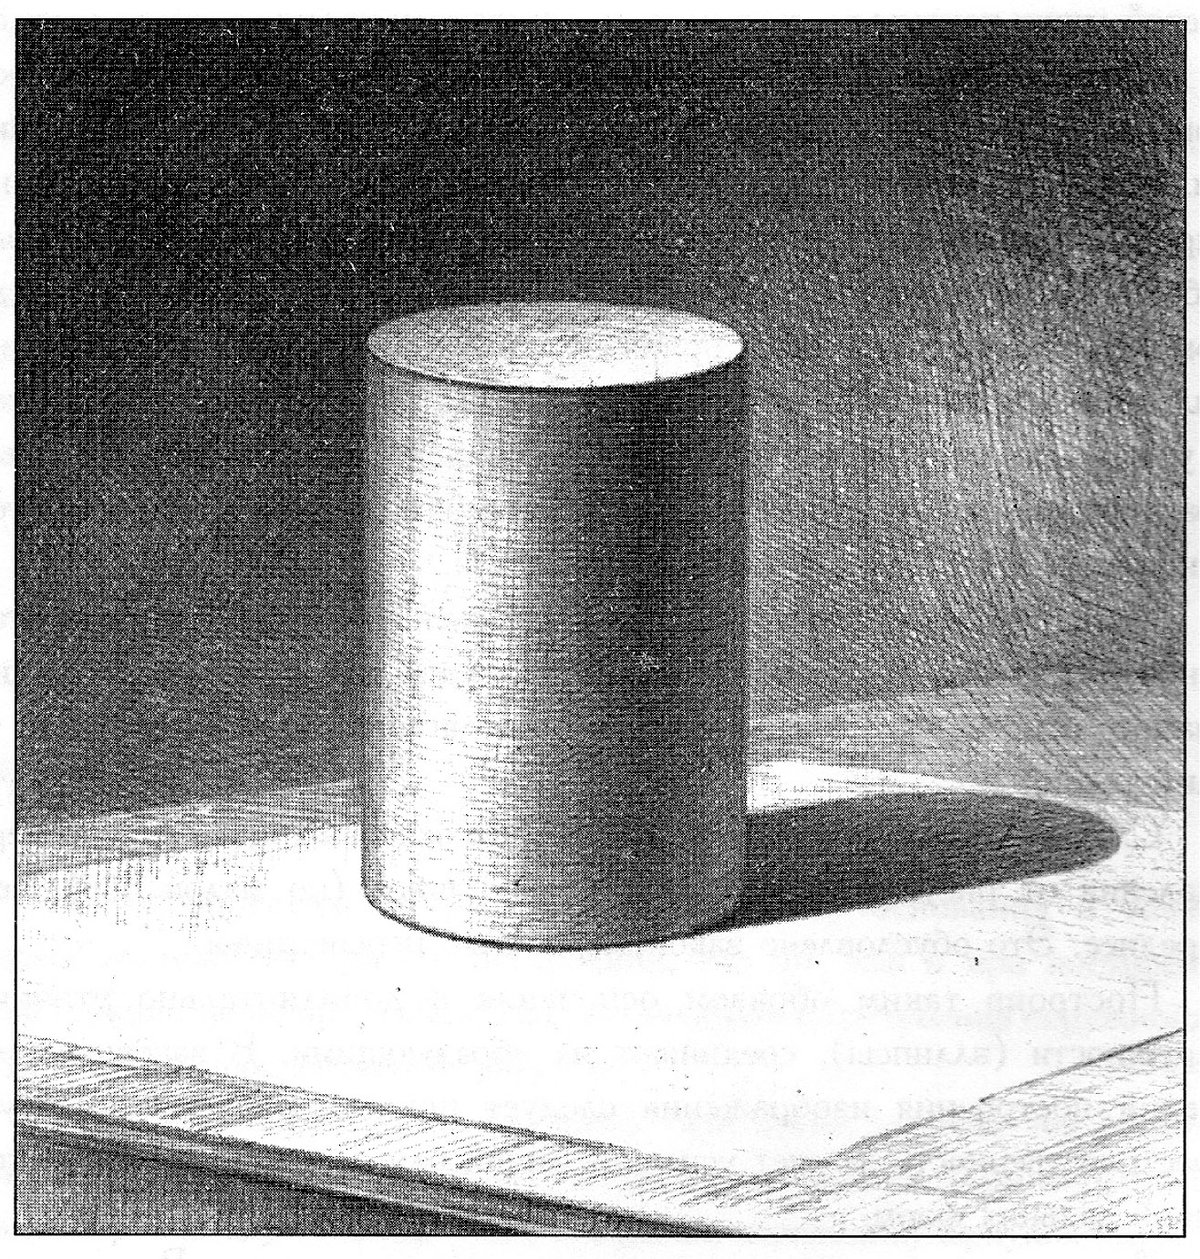 Картинка с тенью карандашом